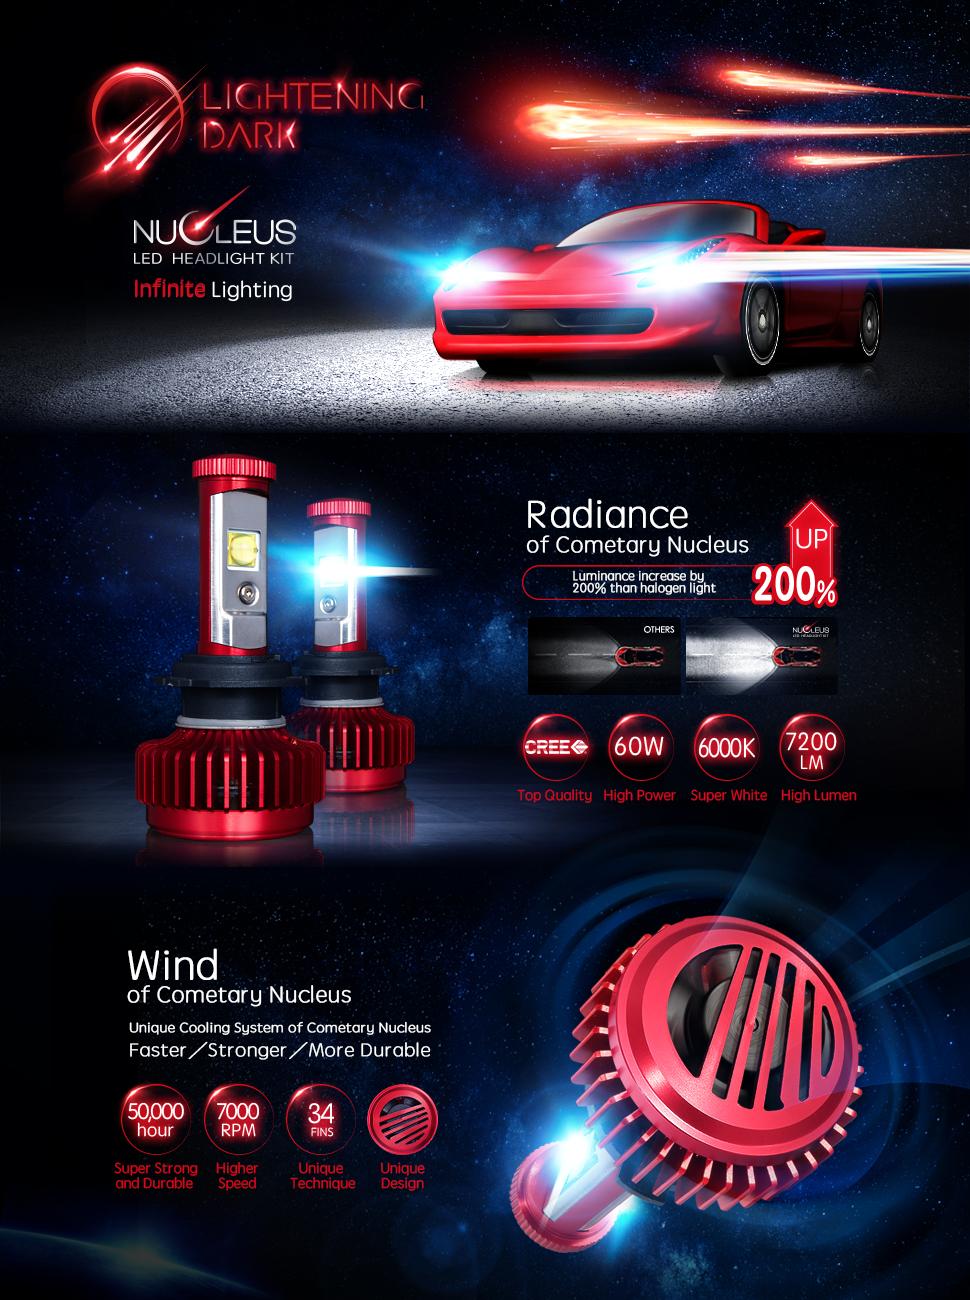 LIGHTENING DARK 10000 Lumens H11 LED Headlight Bulb CREE Chips H8 H9 Conversion